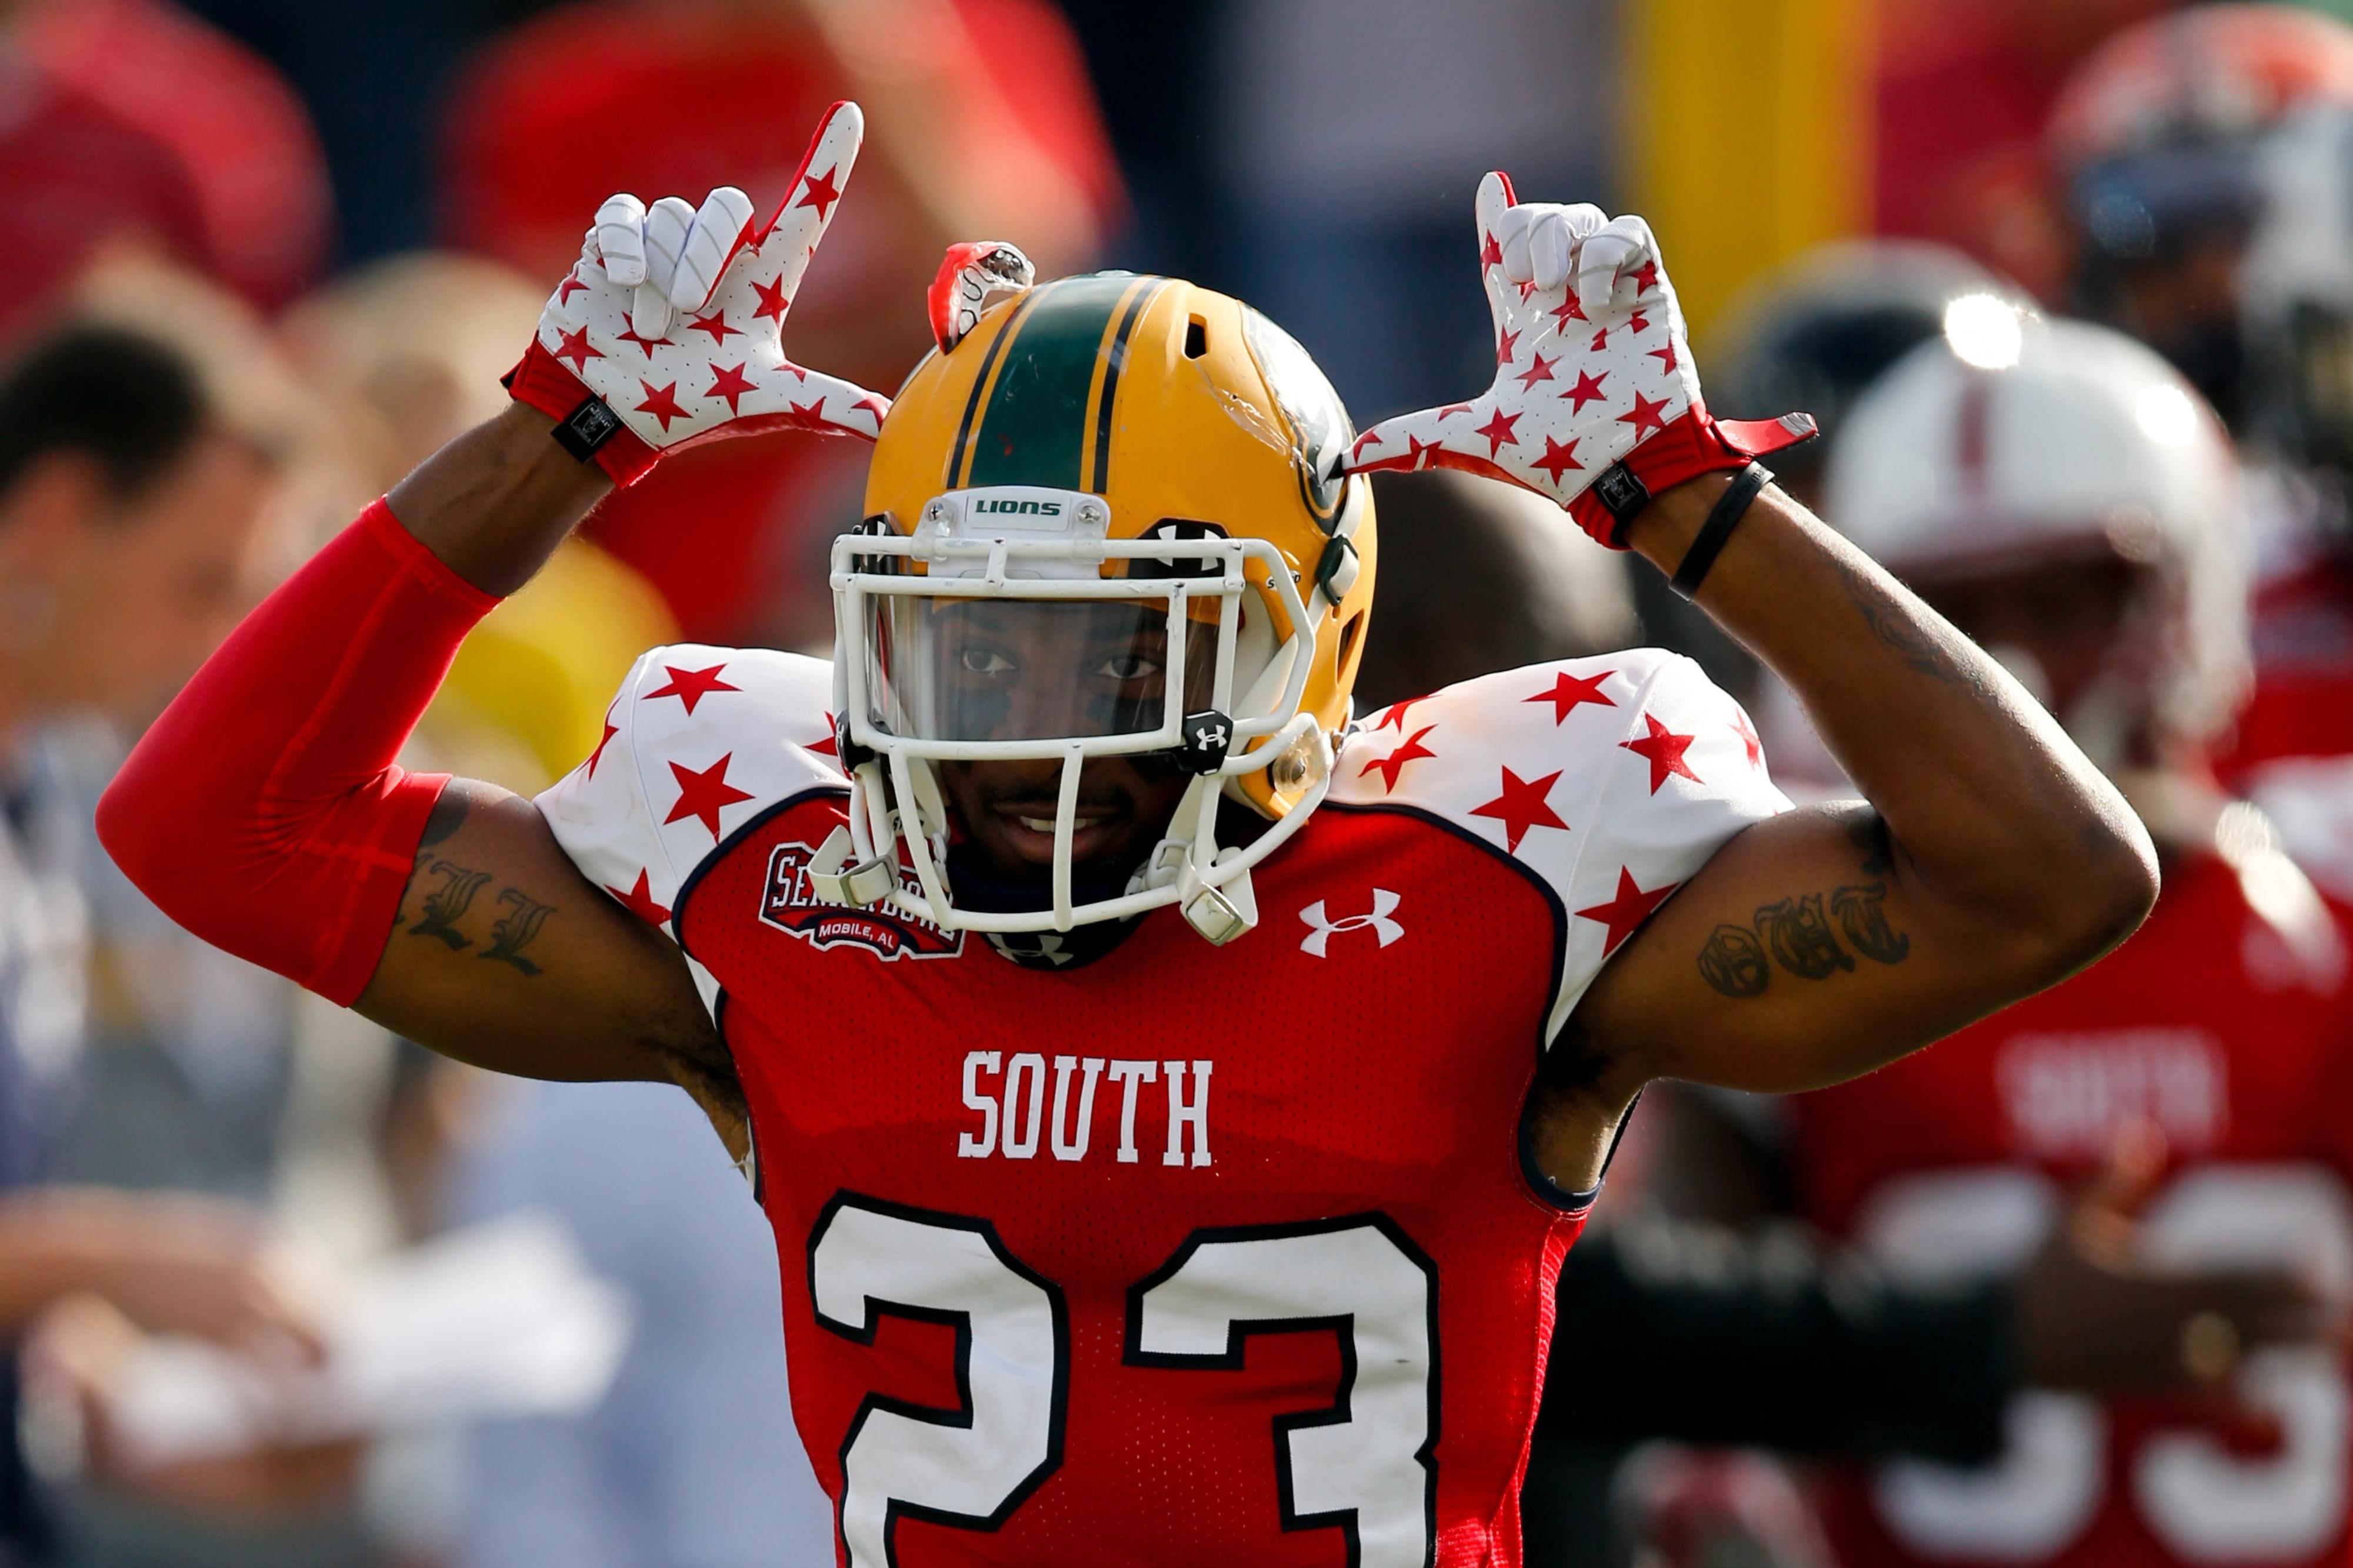 NFL Draft results 2013 Robert Alford selected by Atlanta Falcons